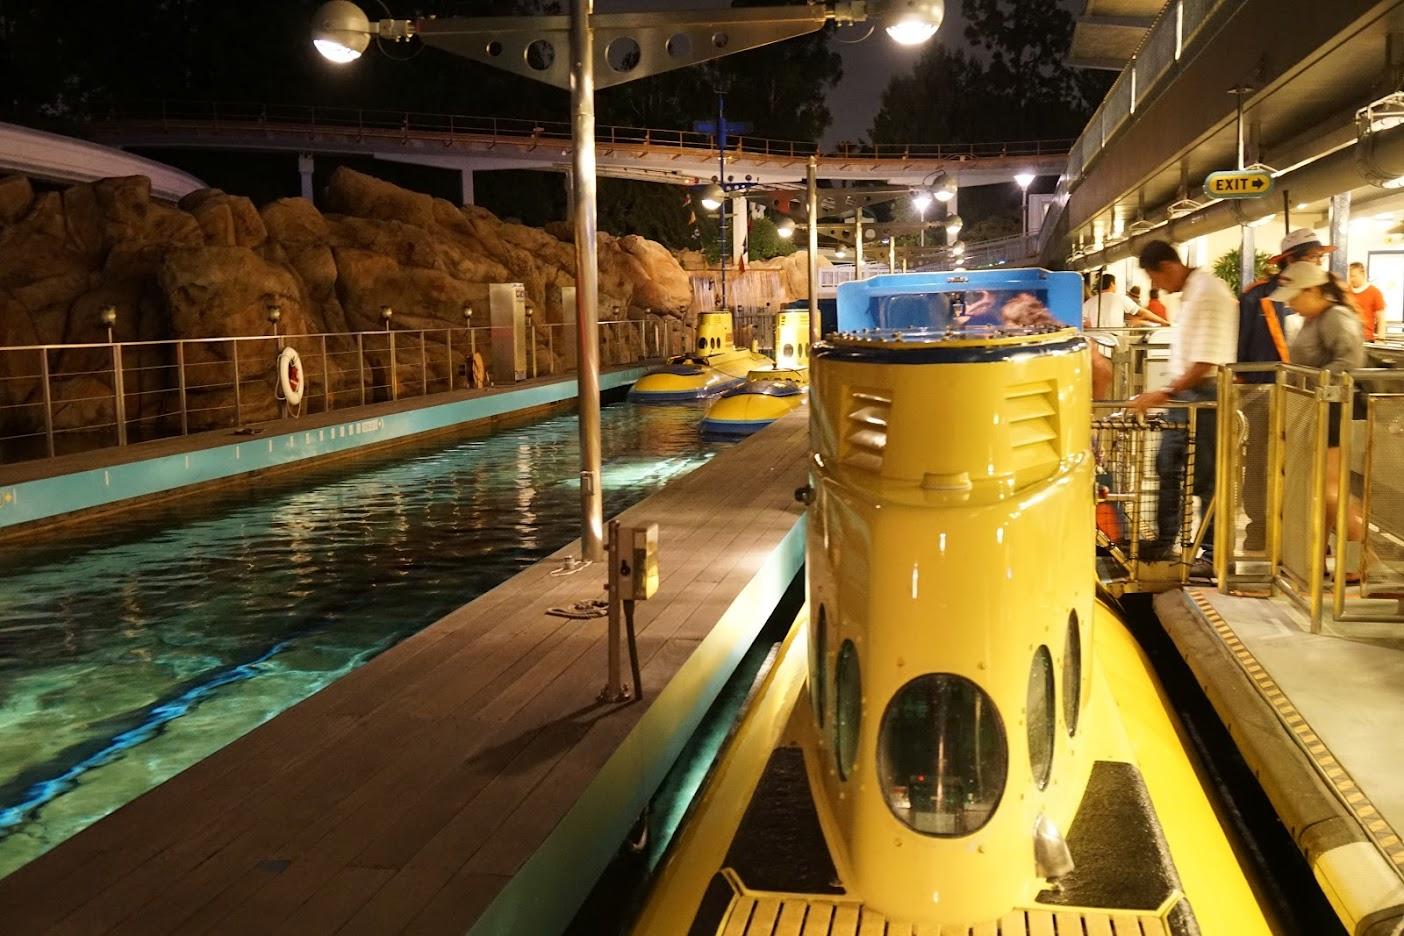 Disney Submarine Nemo